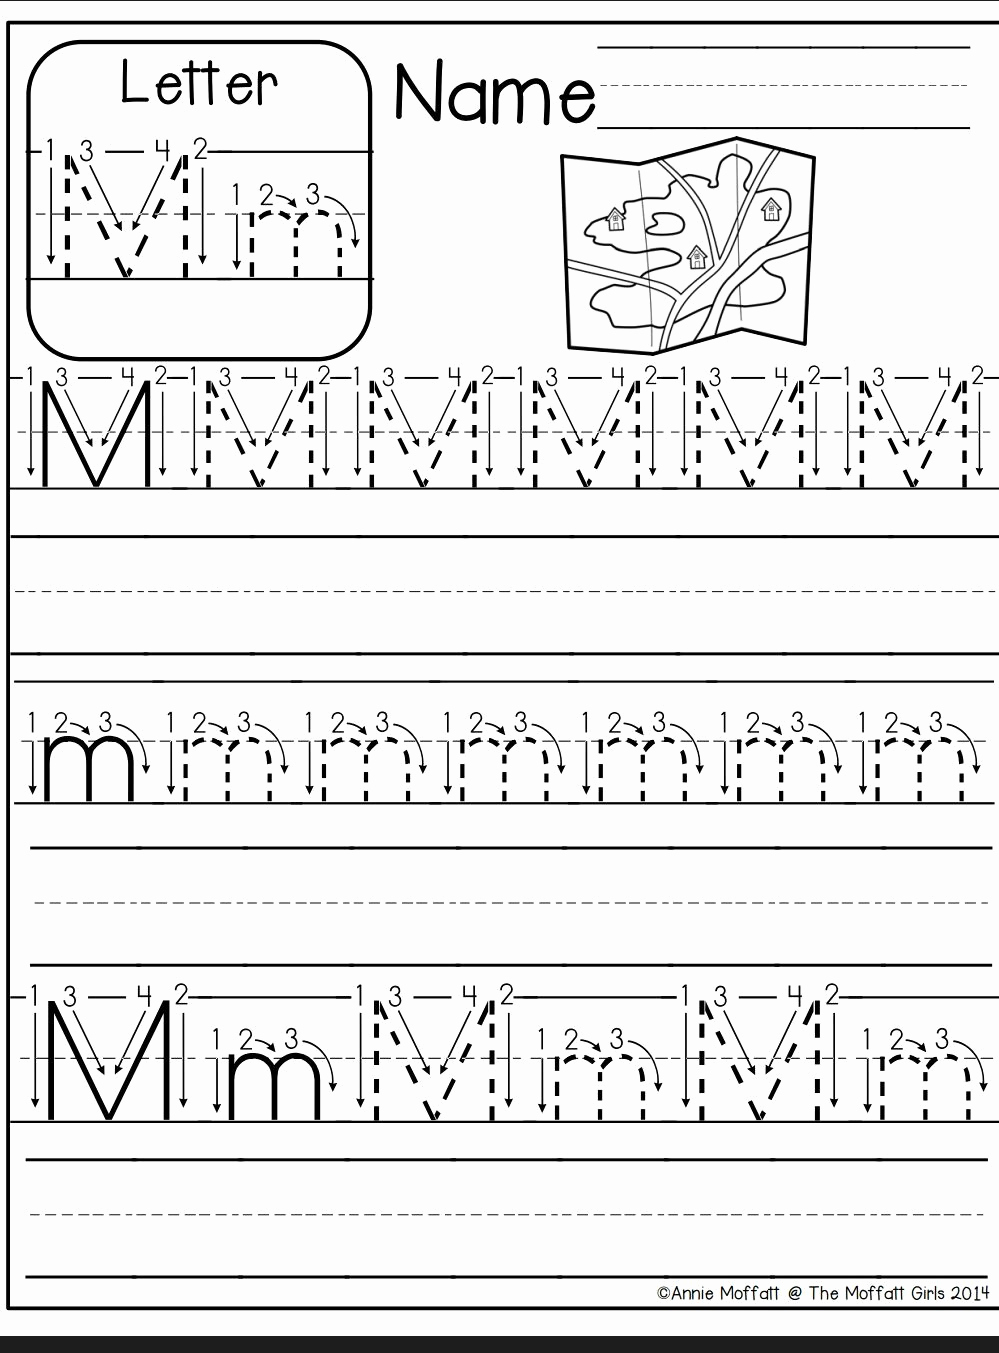 M Worksheets Preschool New Tracing Letter M Worksheets Kindergarten